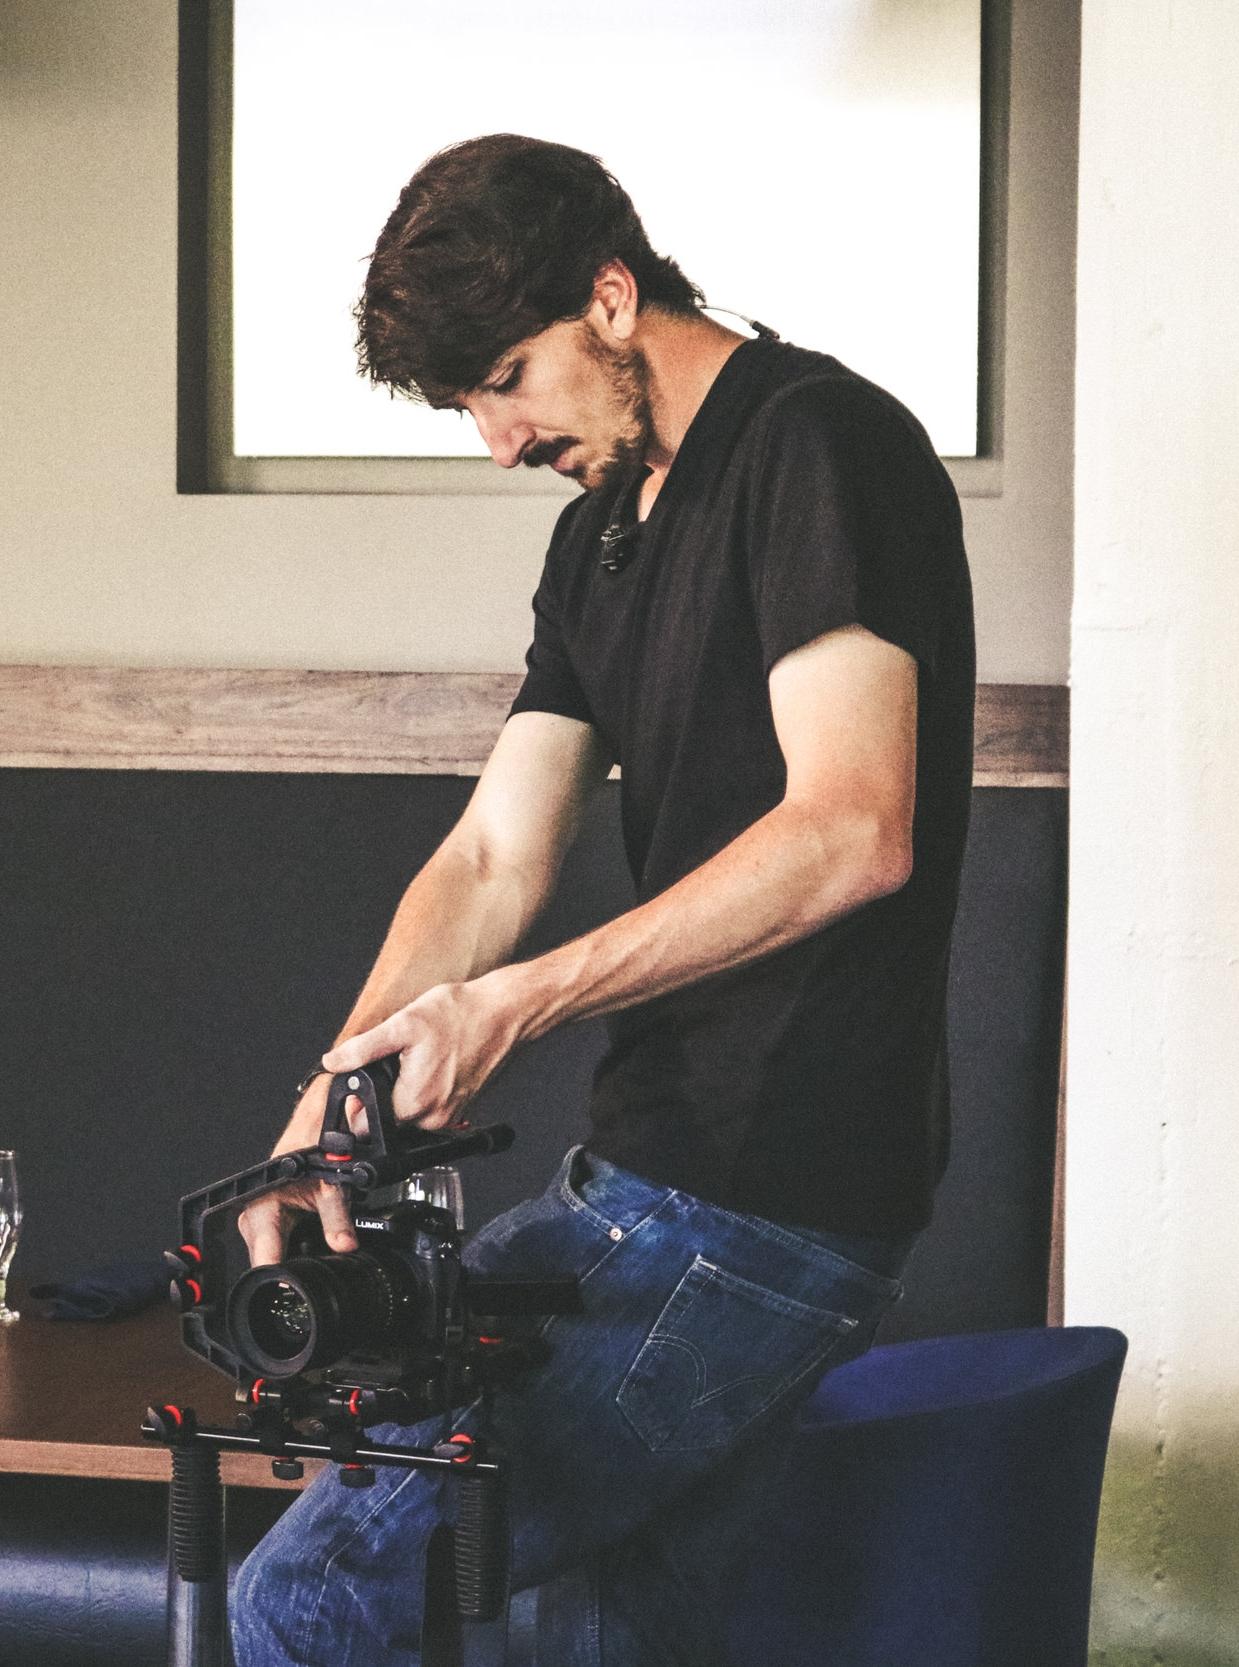 MADISON REYNOLDS - CREATOR OF TOO TALL MEDIACINEMATOGRAPHER /EDITOR